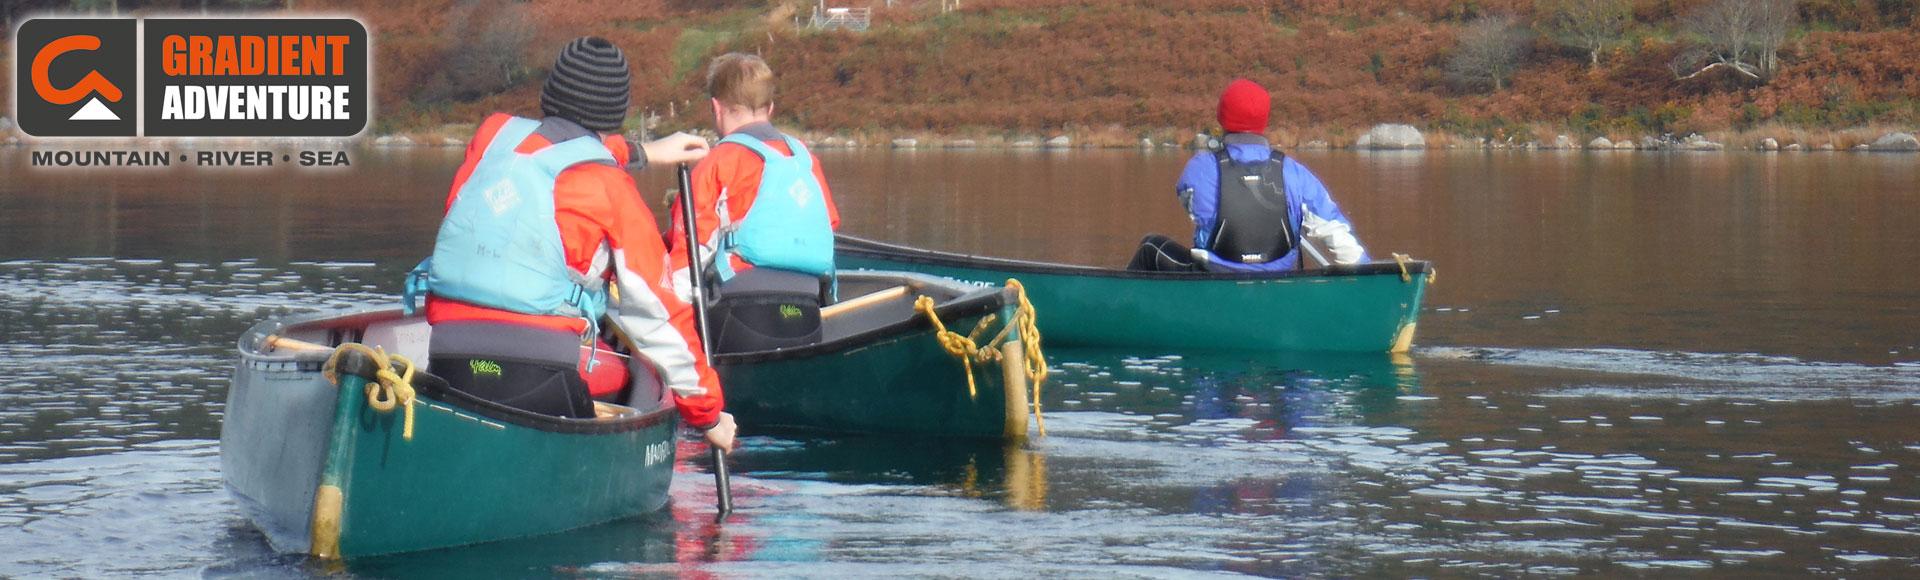 Menai Straits Mini Canoe Expedition - Gradient Adventure